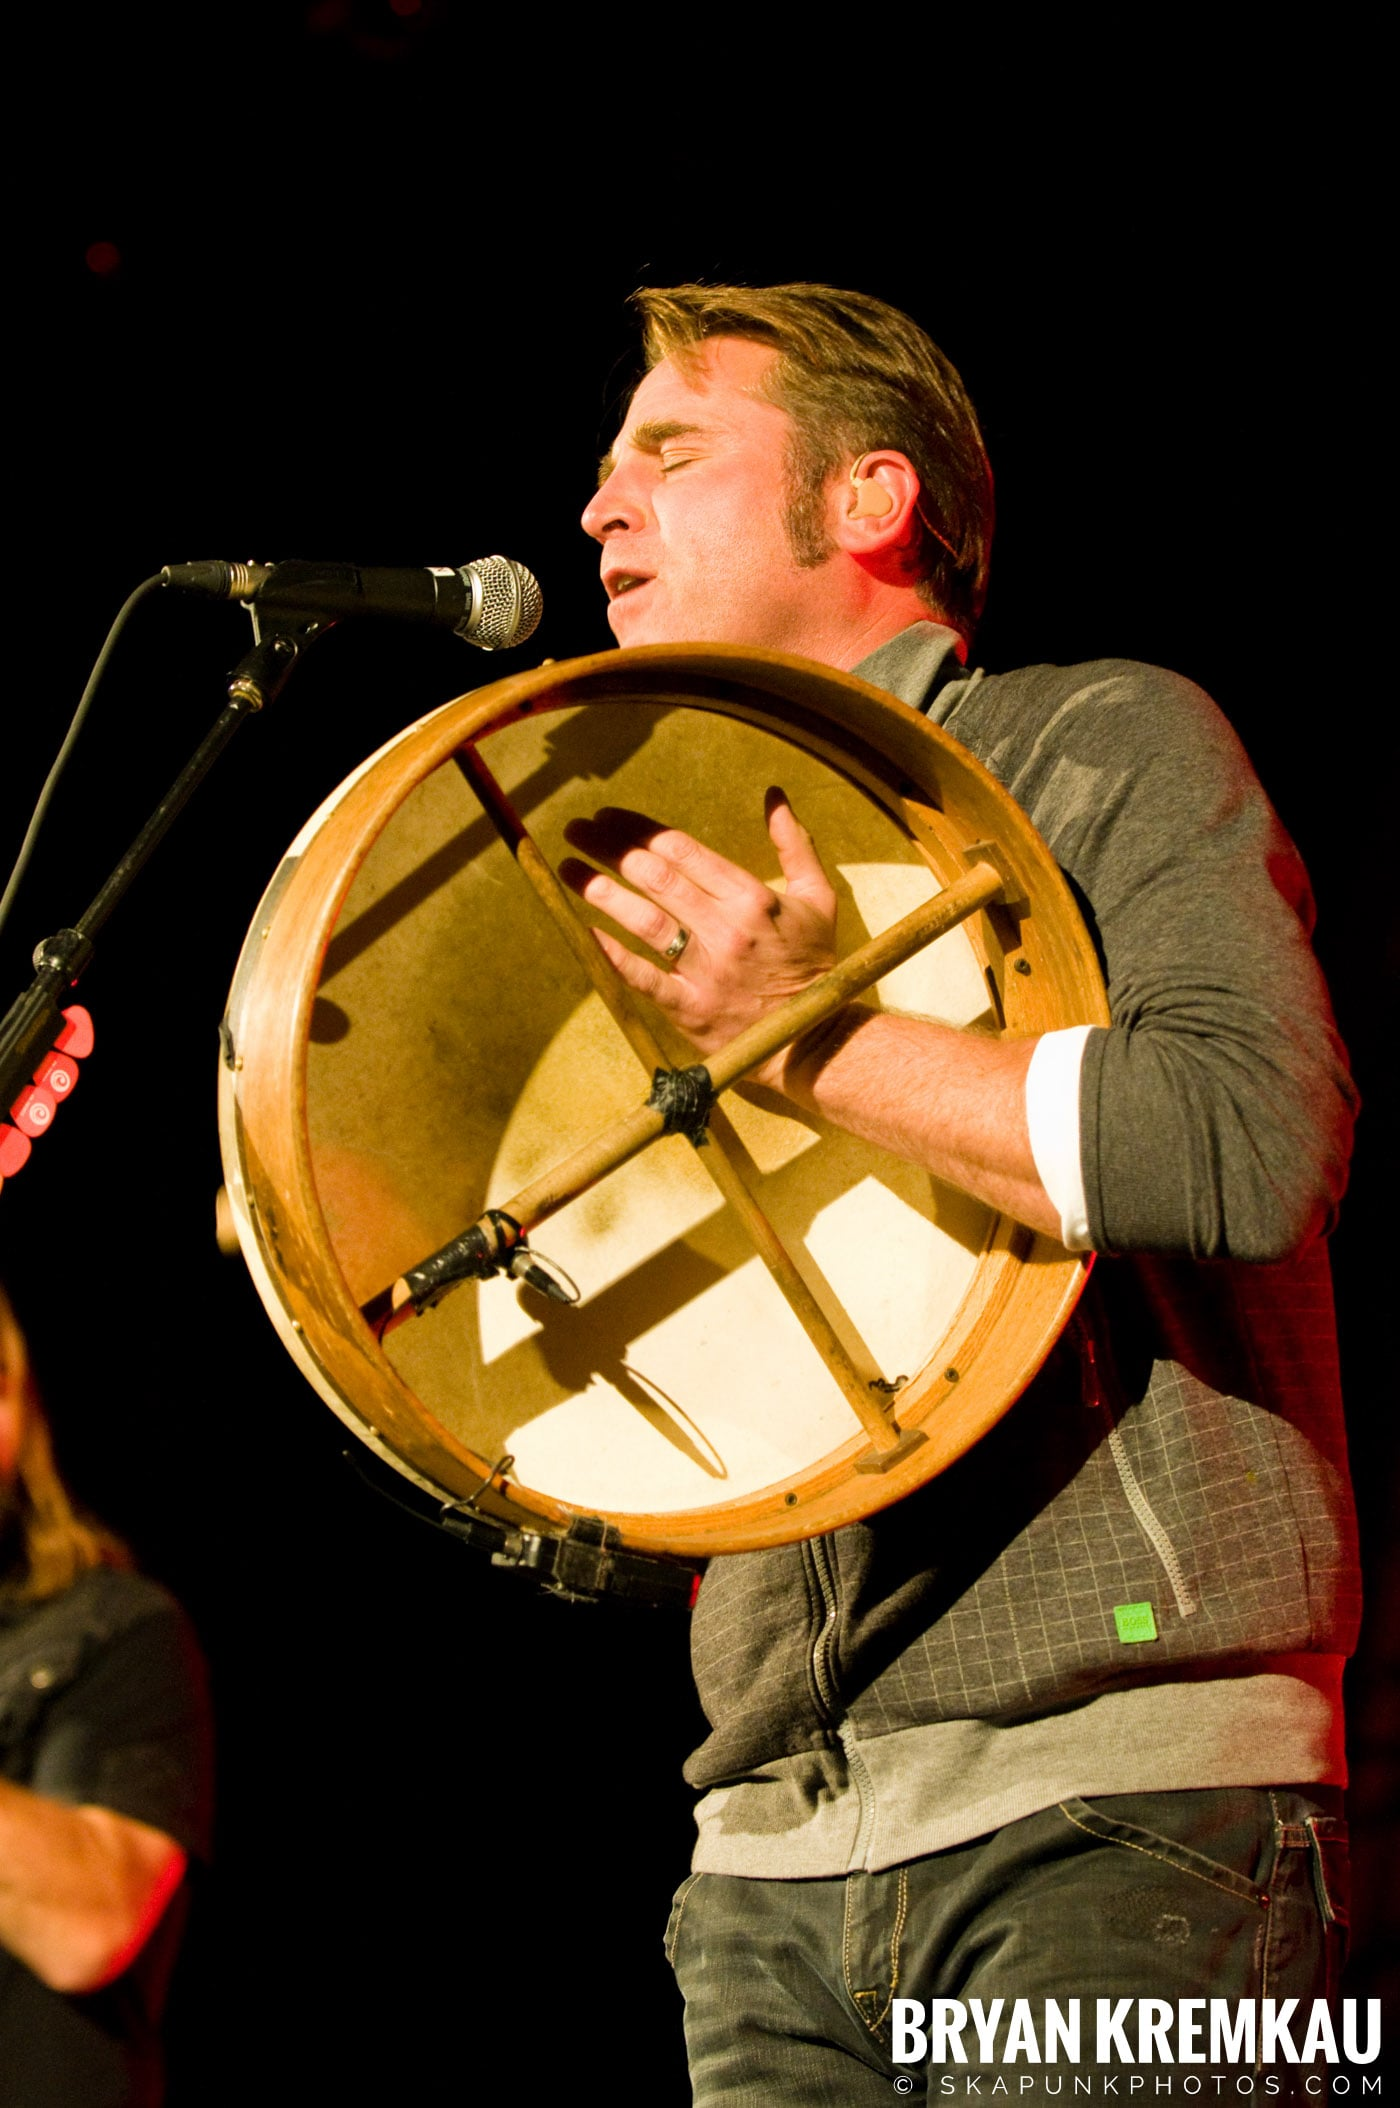 Great Big Sea @ Tarrytown Music Hall, Tarrytown, NY - 10.10.09 (29)